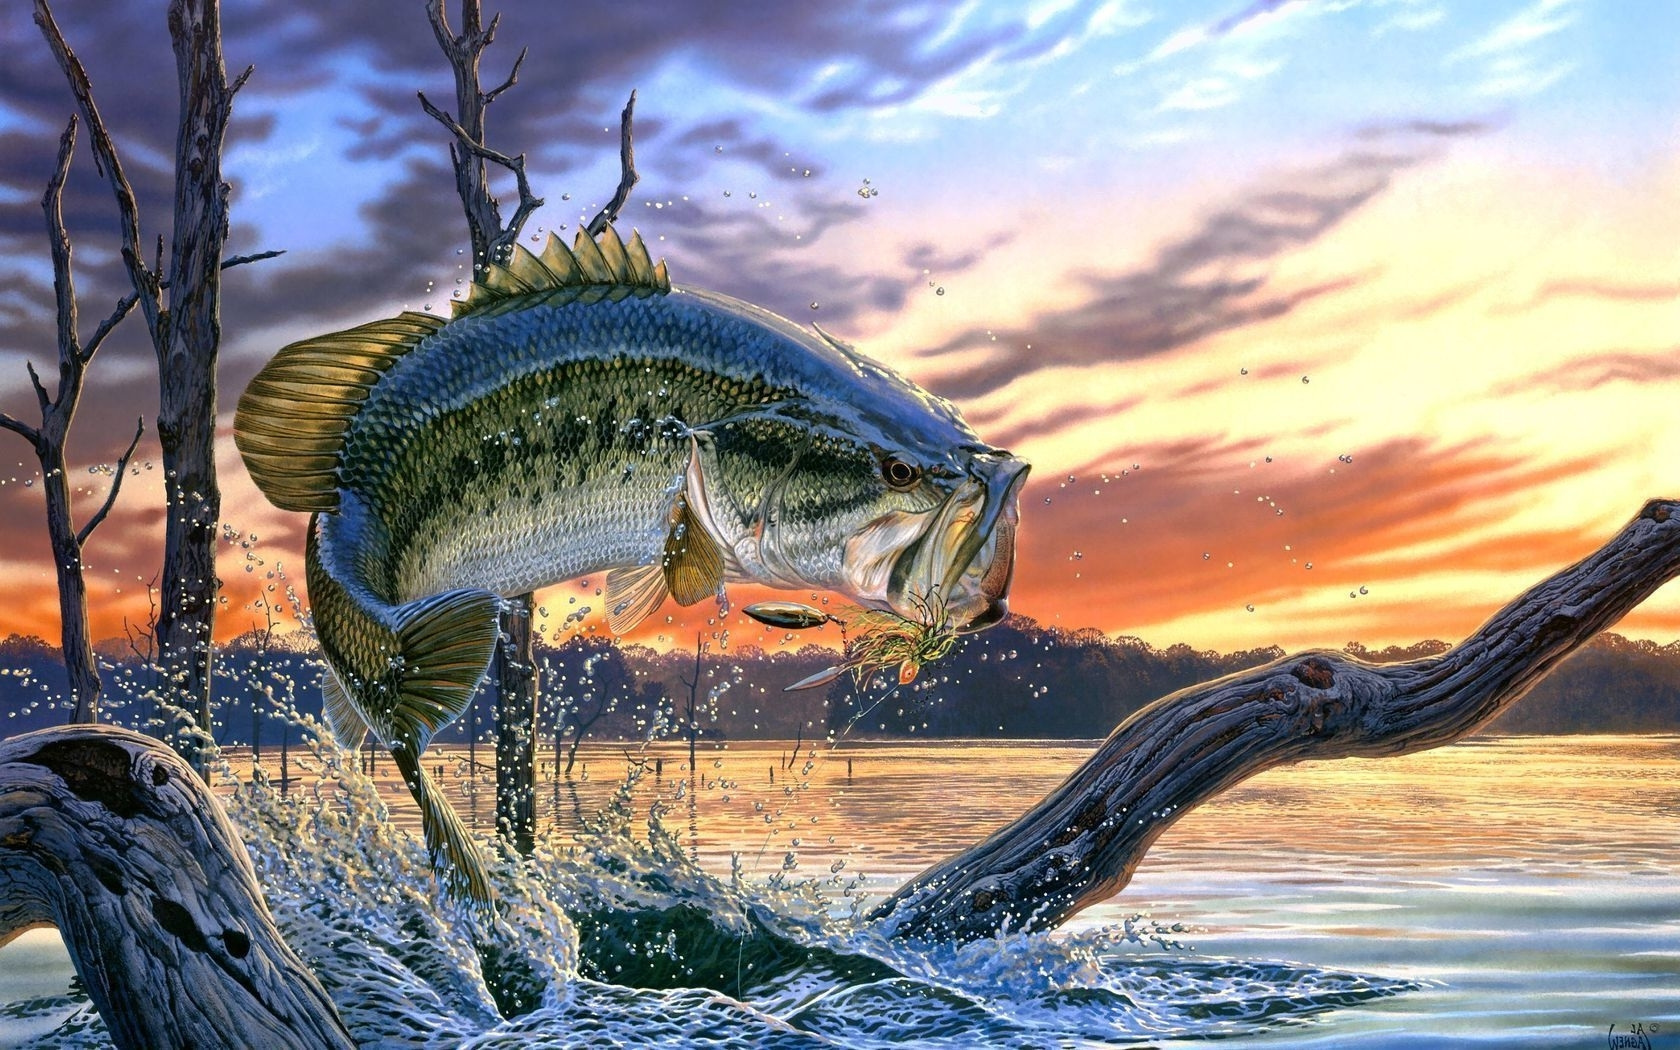 bass fishing | bass fishing wallpaper backgrounds wallpaper cave